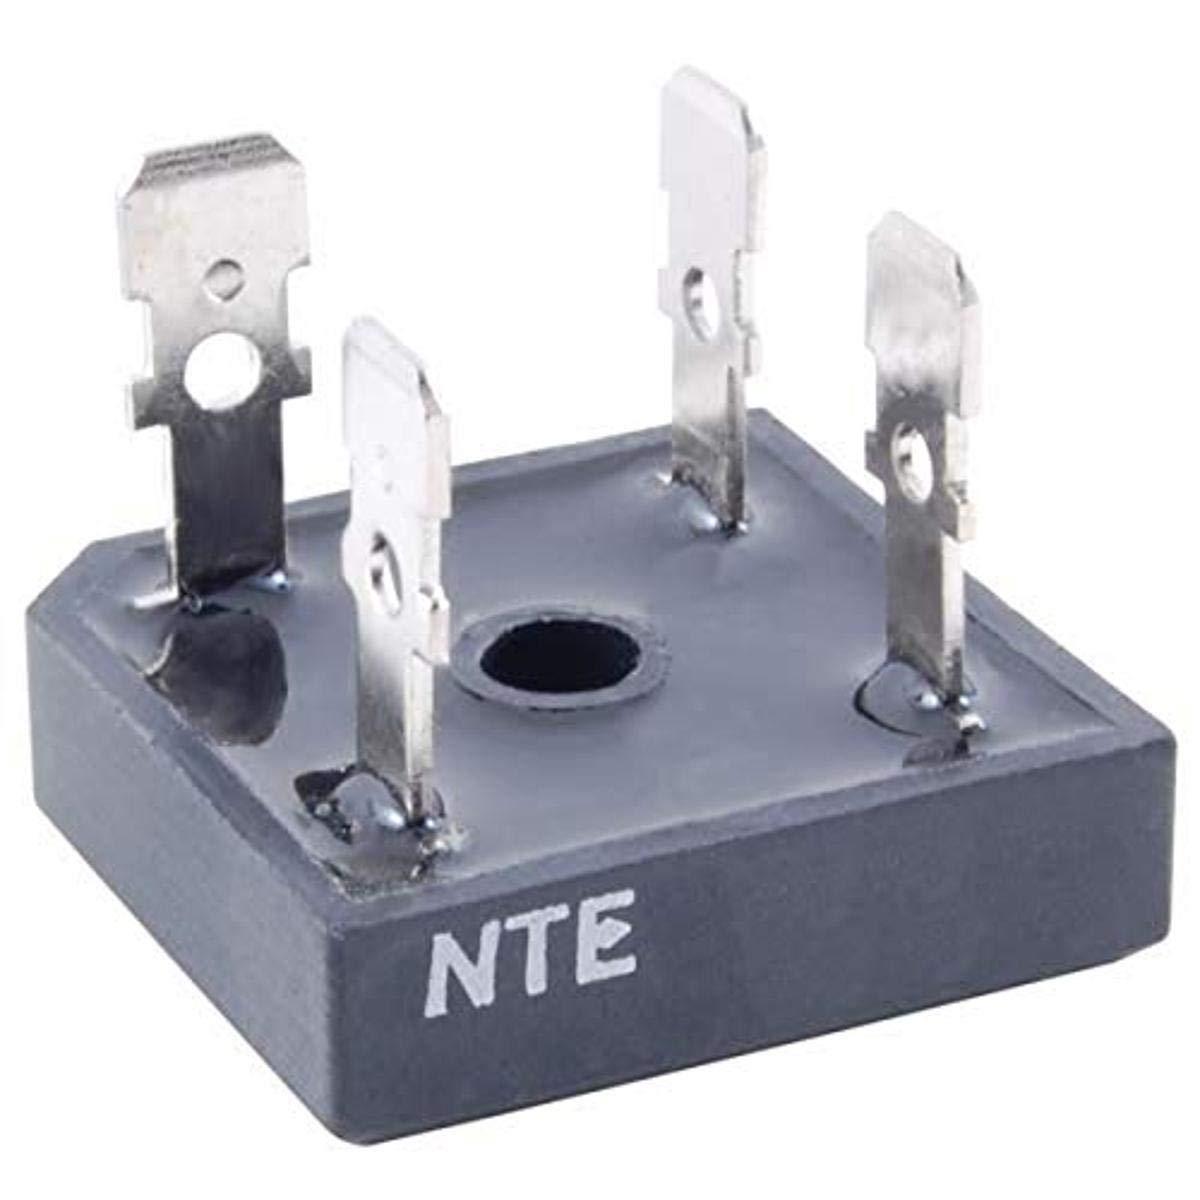 NTE Electronics NTE5302 BRIDGE RECTIFIER FULL WAVE SINGLE PHASE 800V 8A SIP PKG